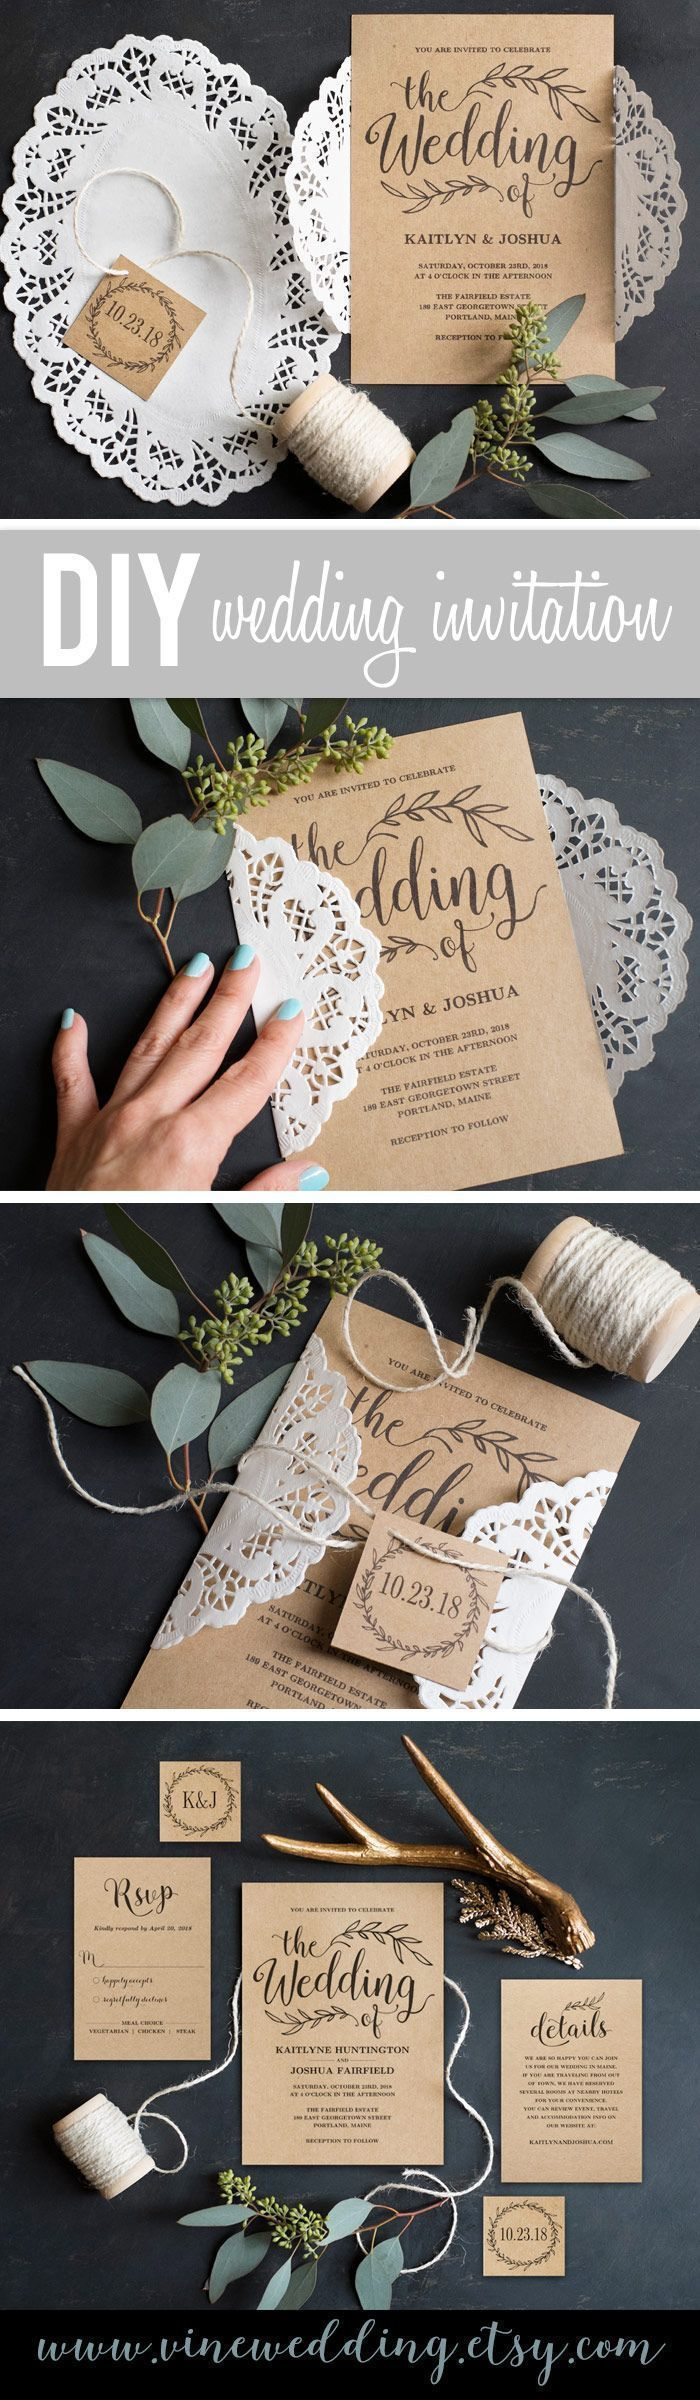 mini book wedding invitations uk%0A DIY Doily Paper Rustic Wedding Invitations   I u    m actually getting married     Pinterest   Weddings  Wedding and Bridal showers